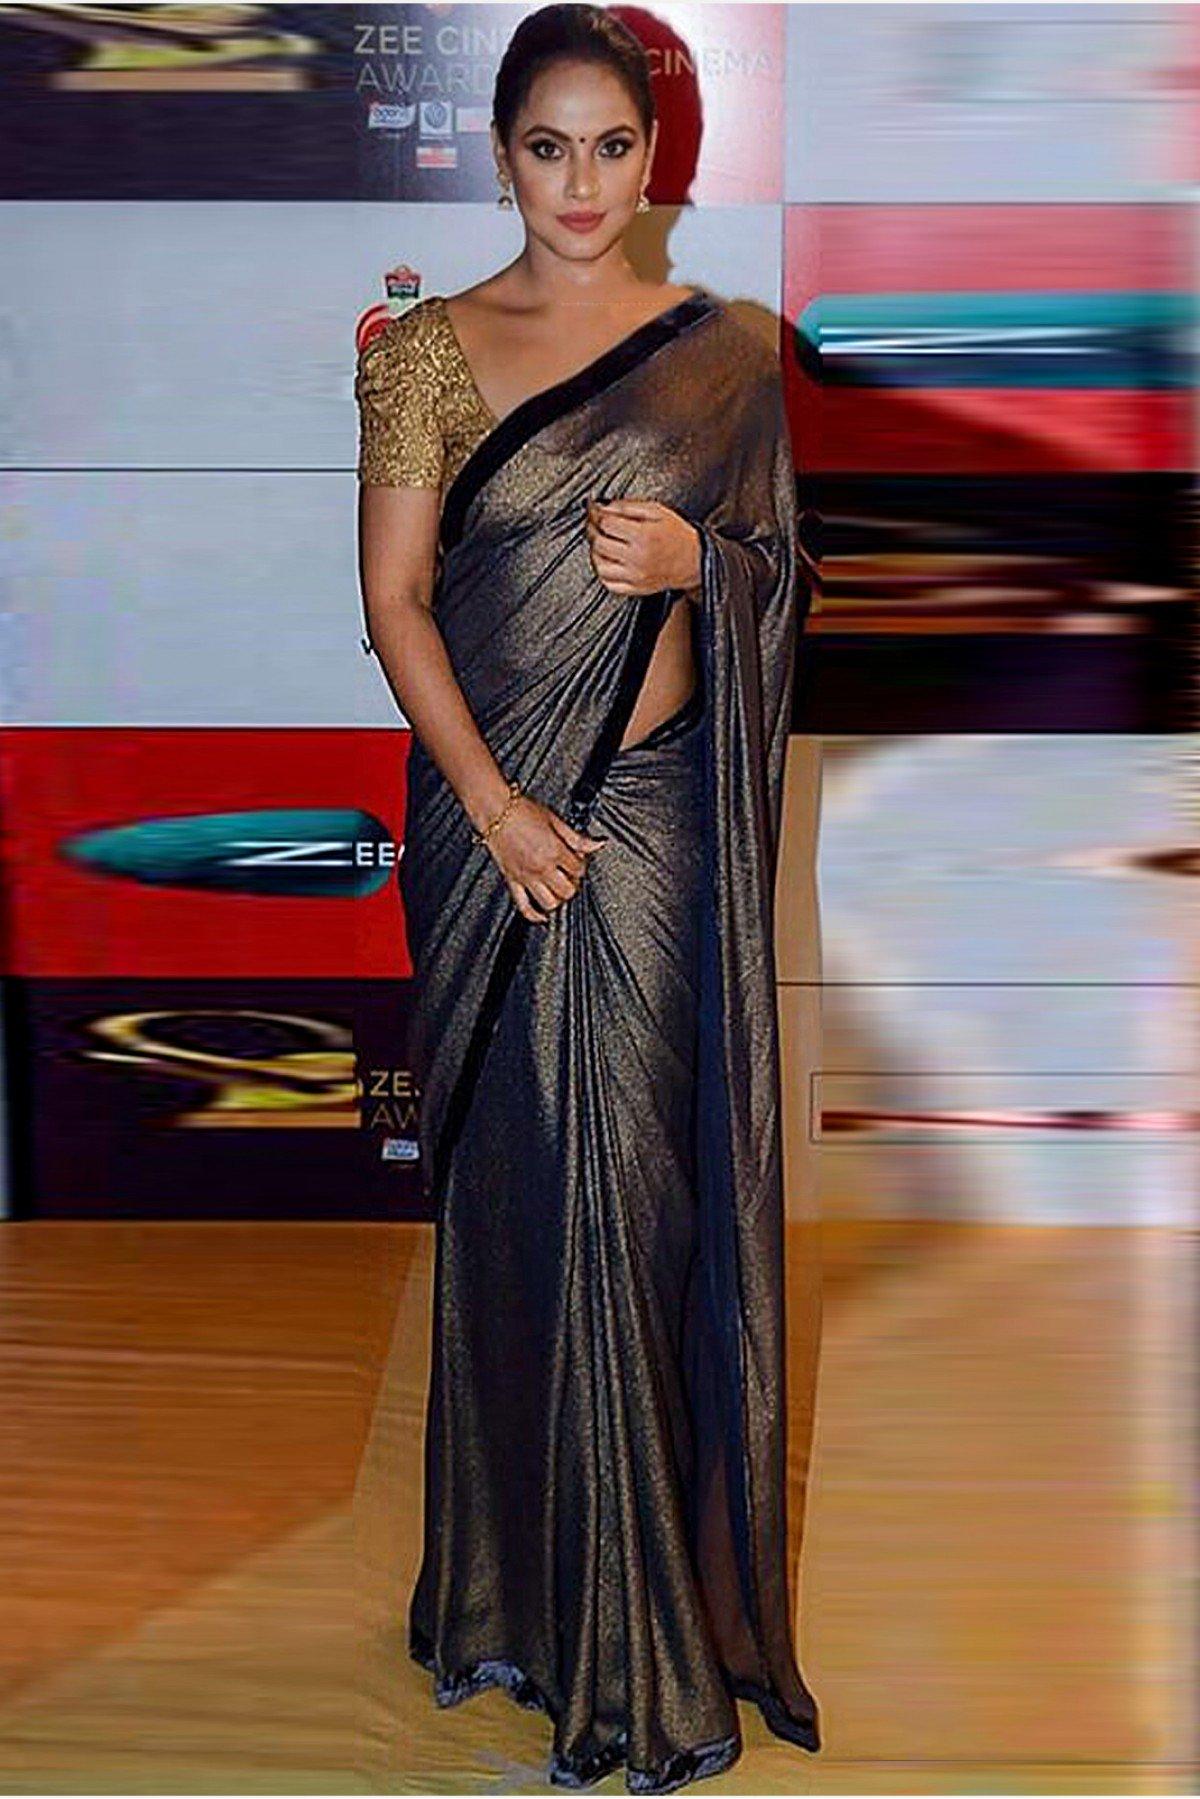 Neetu-Chandra-Saree-Pics Scorching Neetu Chandra 11+ Unseen Bikini Swimsuit Photos Age Ft Wiki